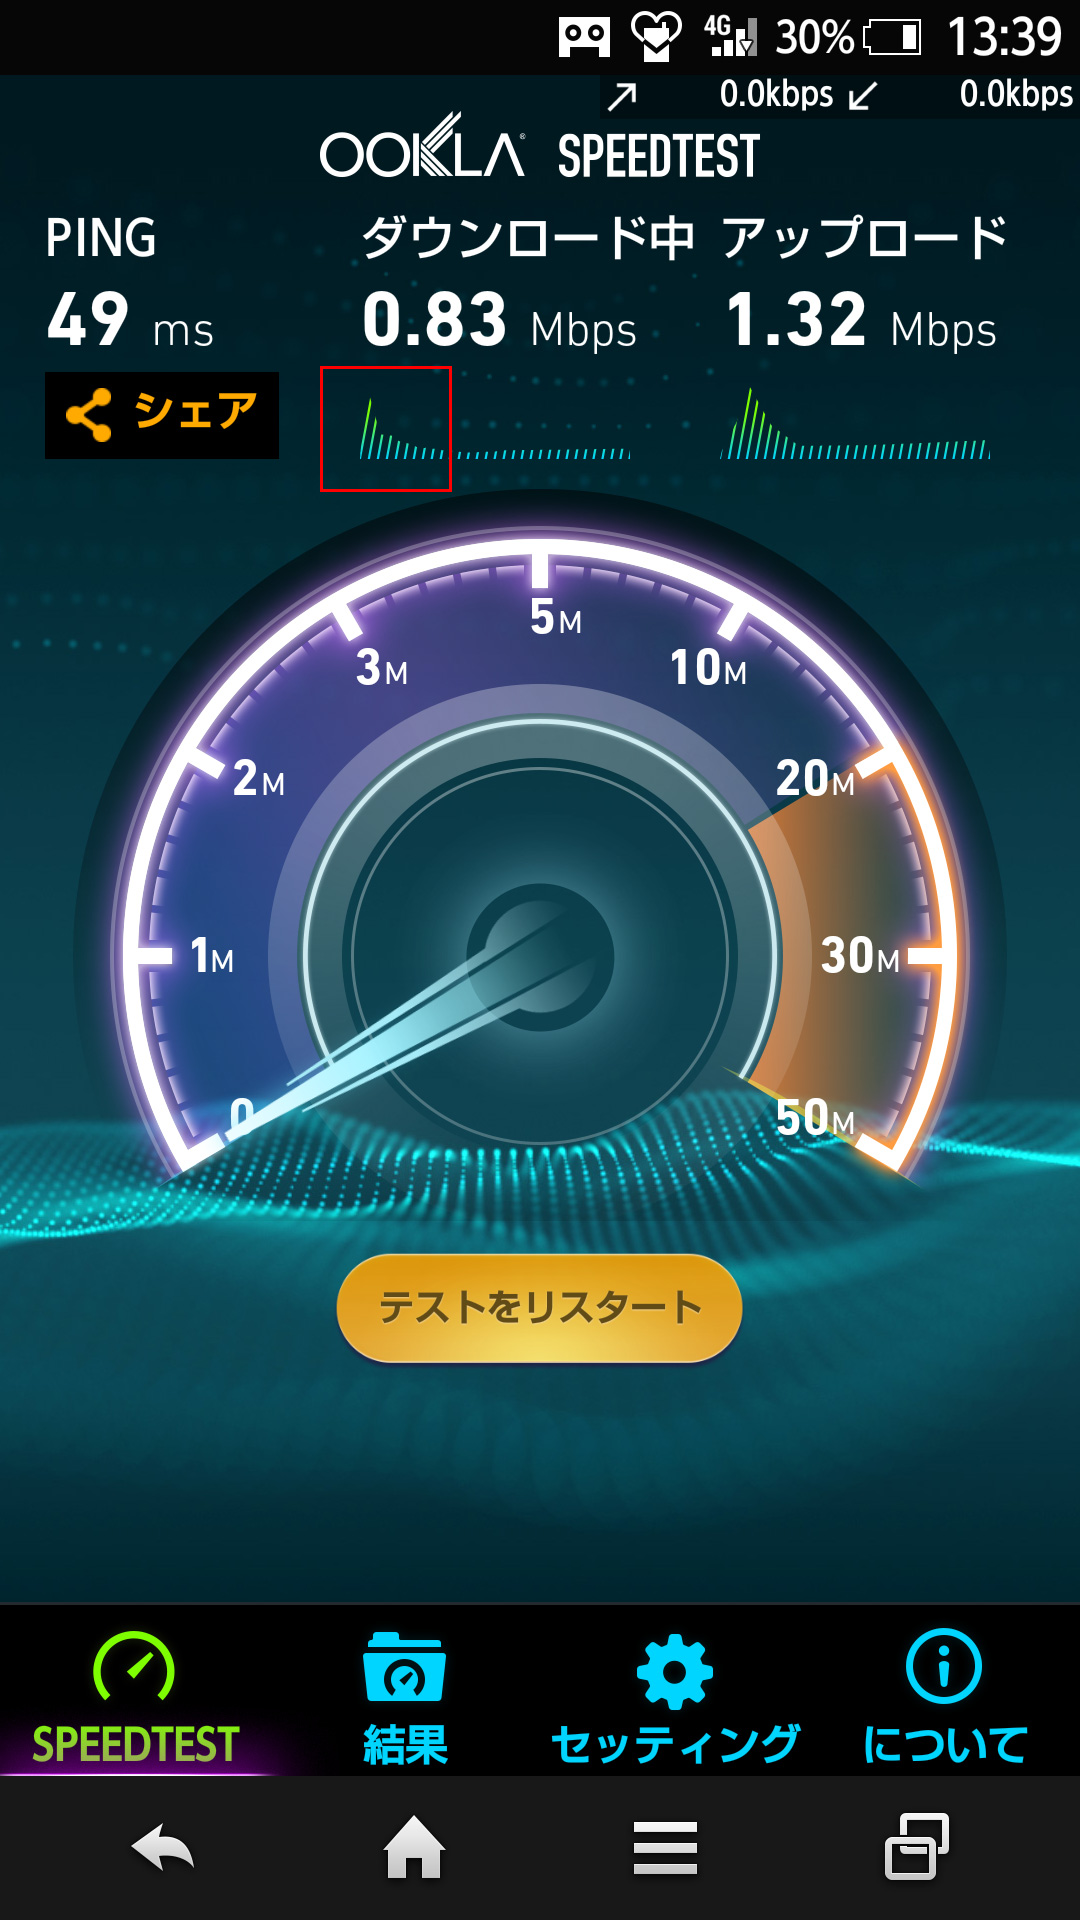 uq-mobile_20150728_1